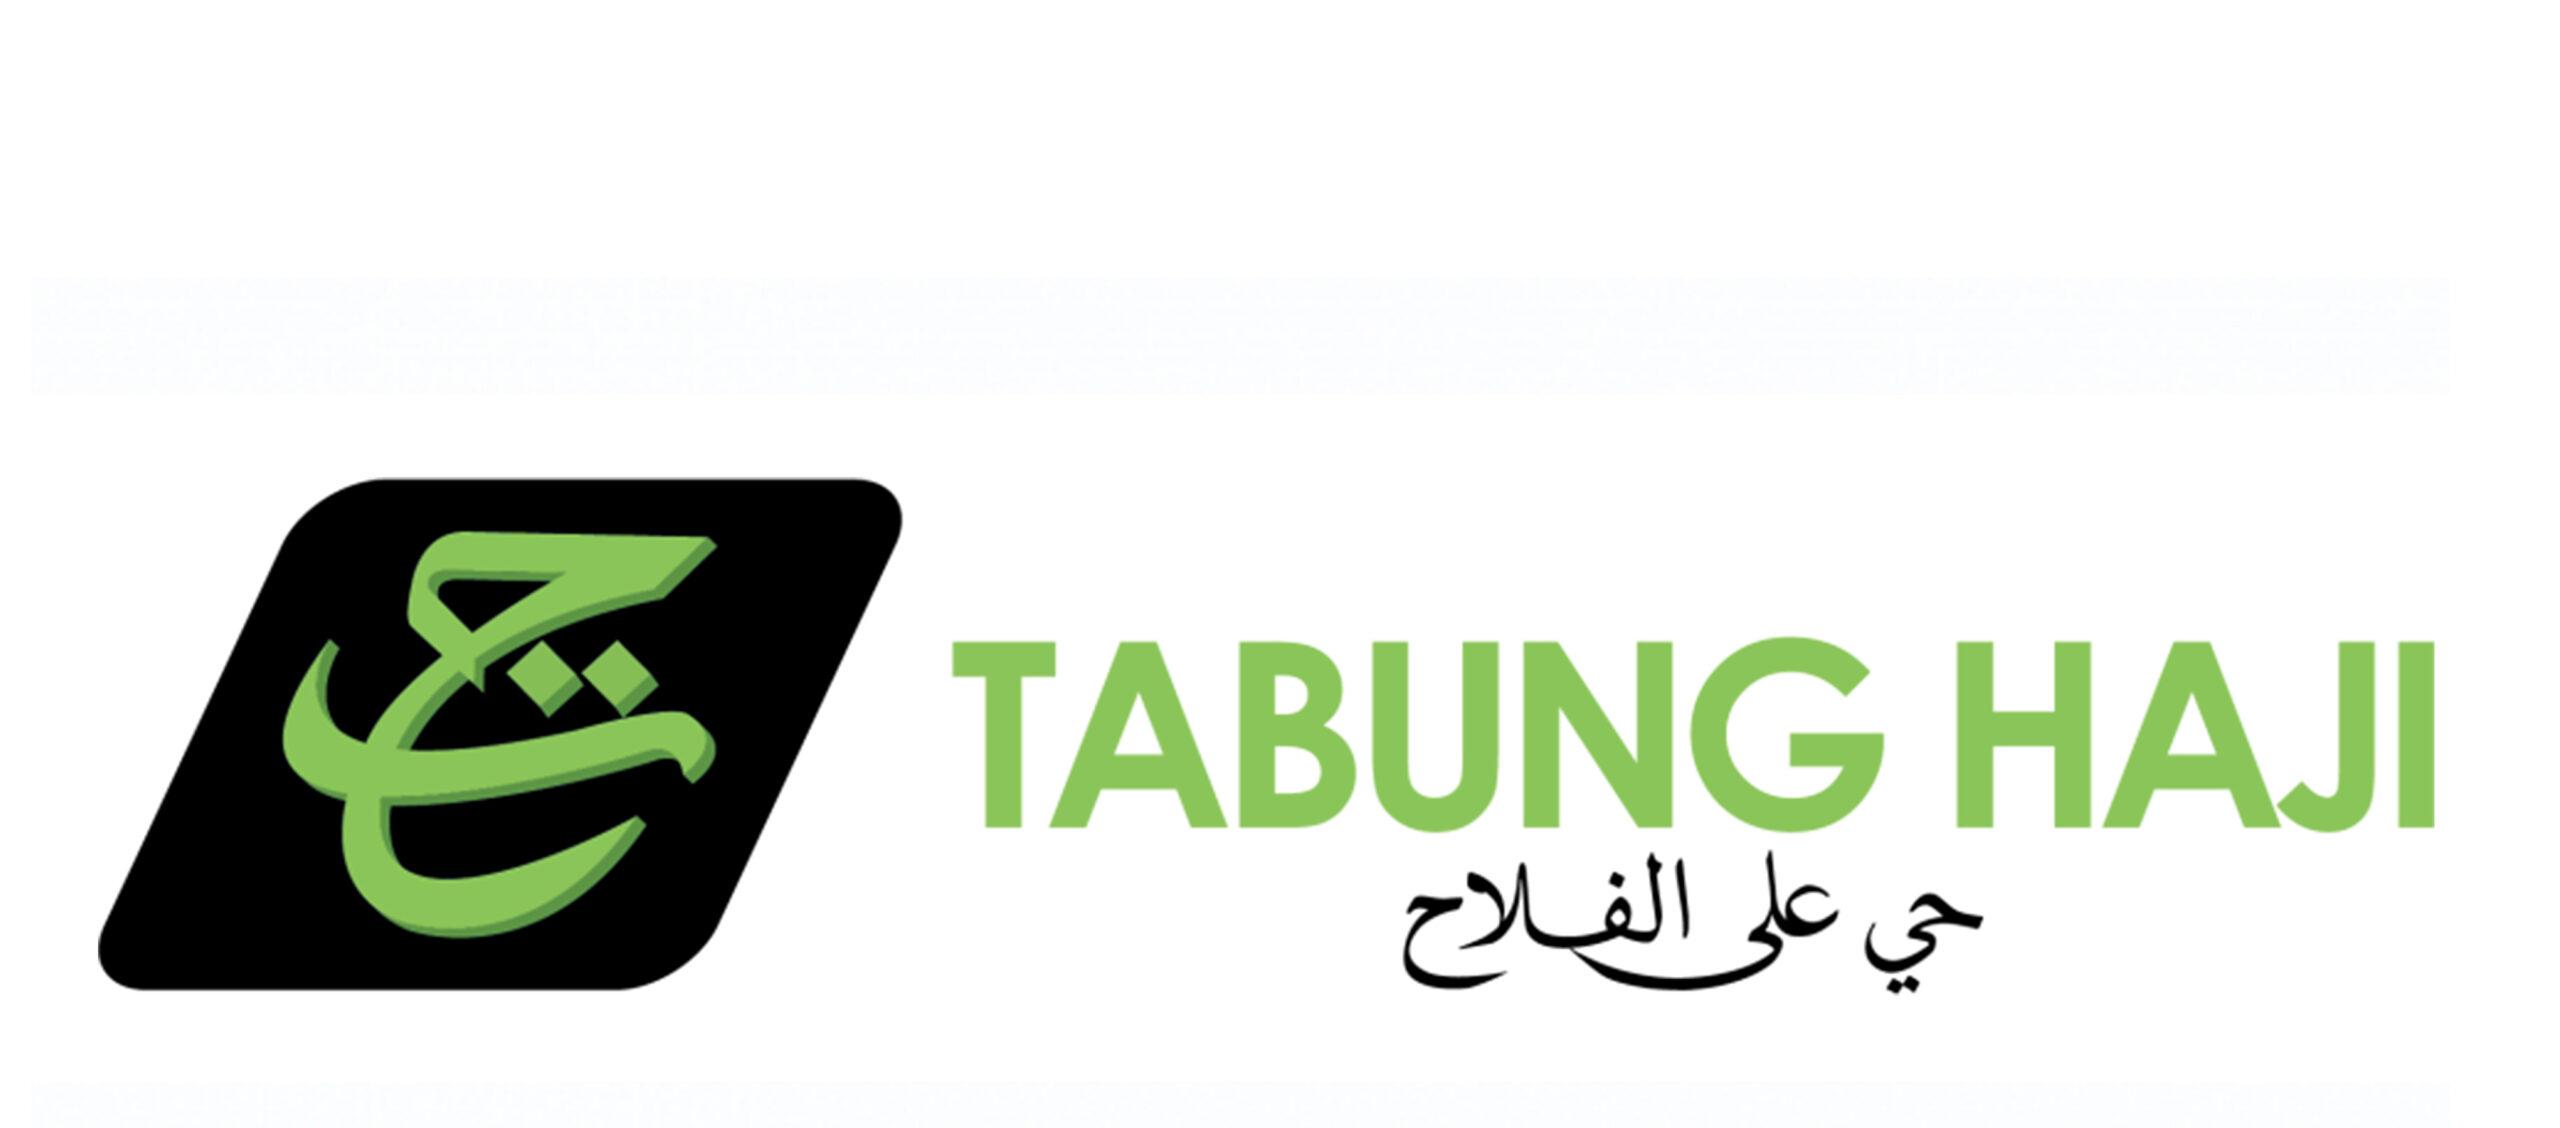 5. Tabung Haji